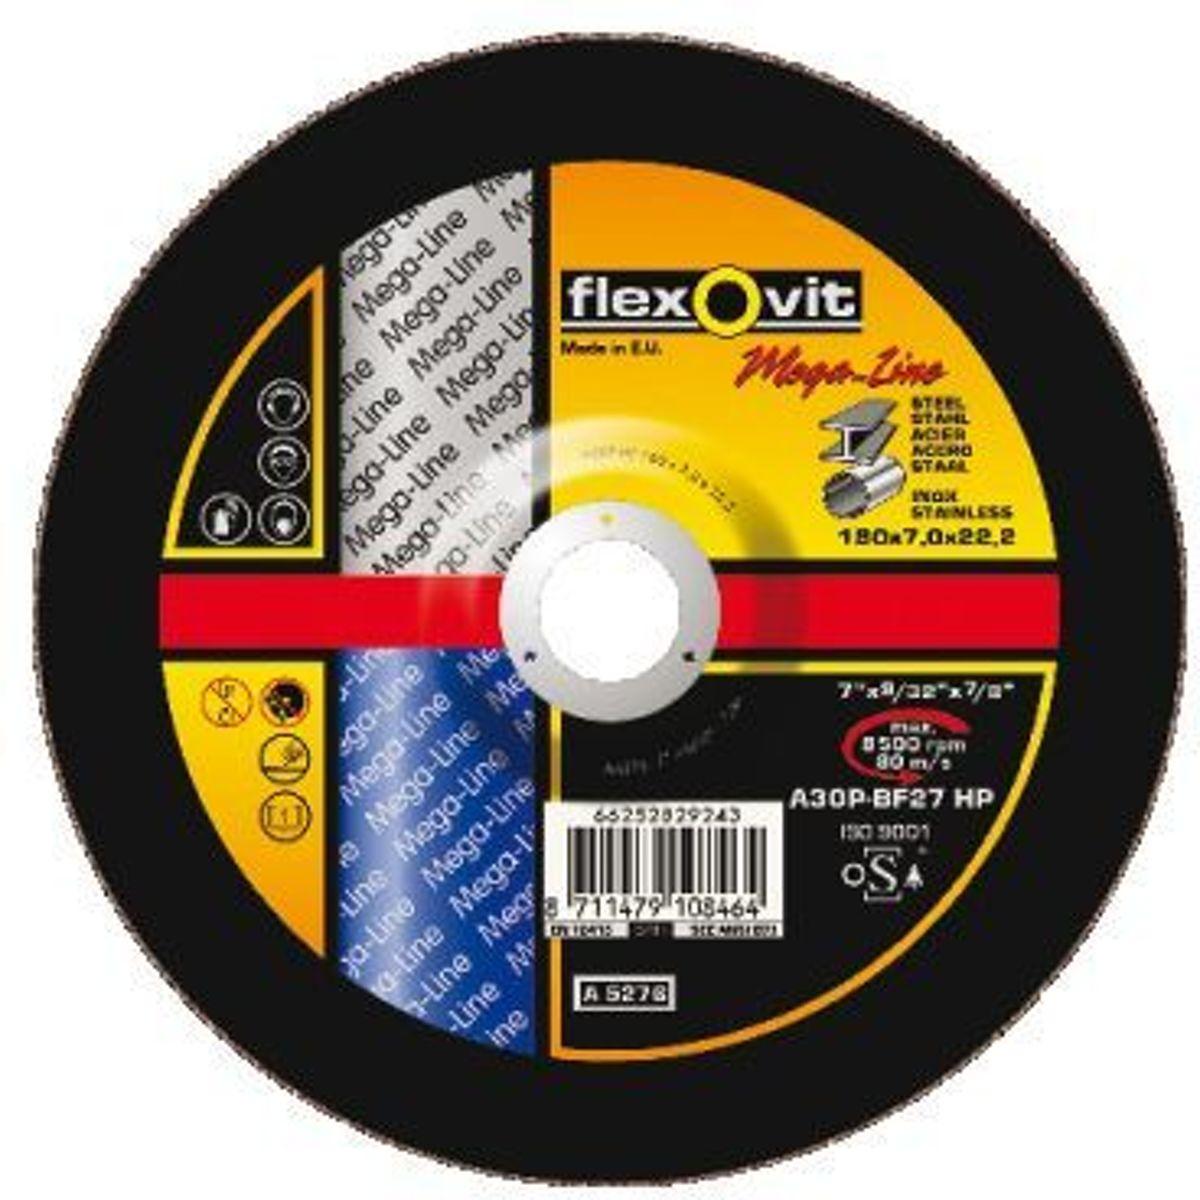 Afbraamschijf Flexovit 180x6.8x22.2 A30P-BF27HP kopen